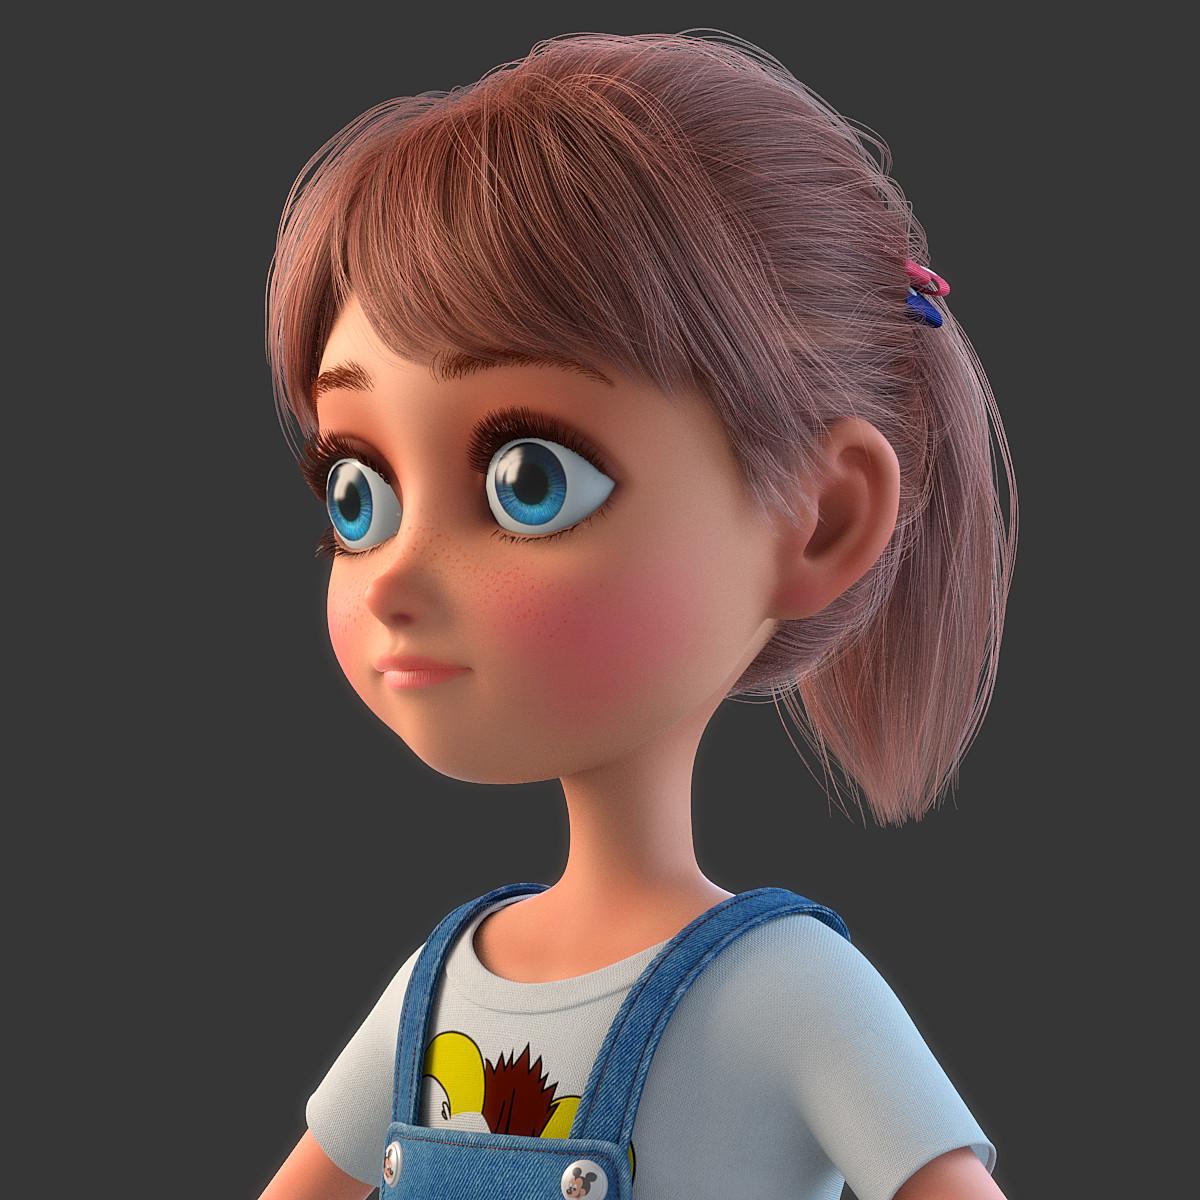 Cartoon Characters 3d Model : D model of cartoon girl rigged